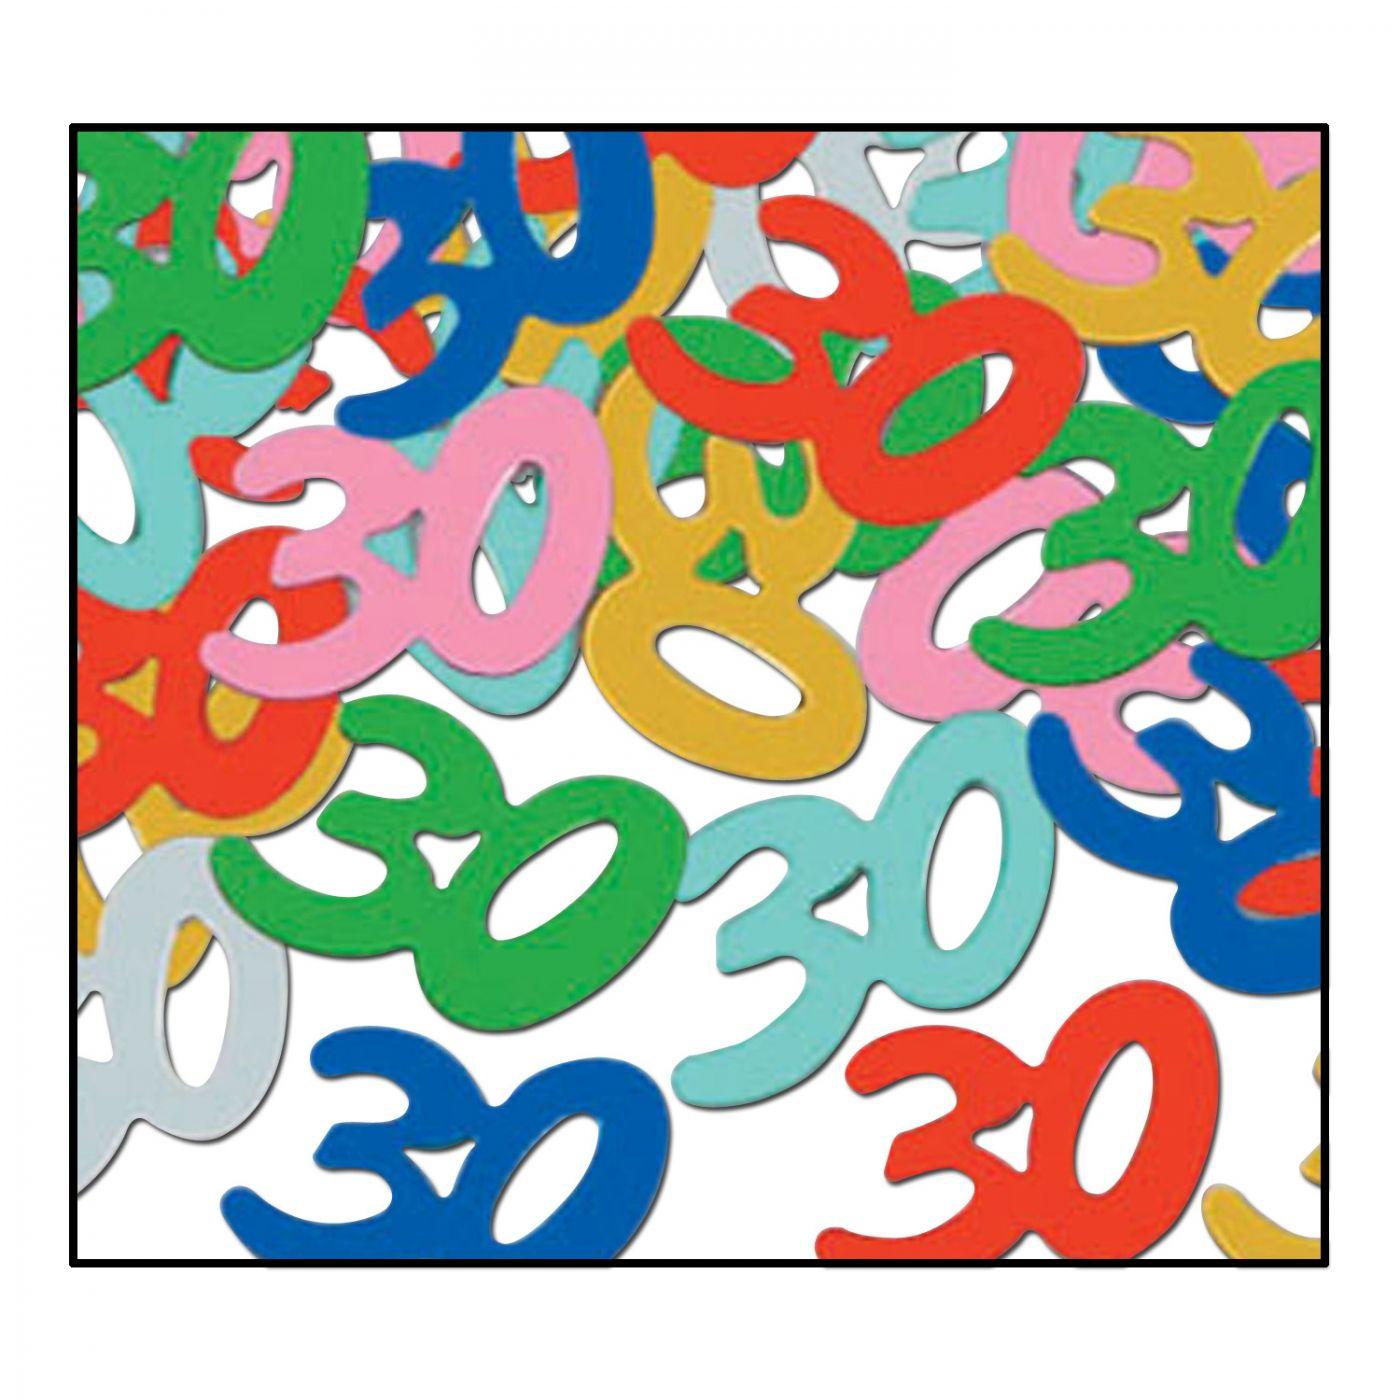 Fanci-Fetti  30  Silhouettes image